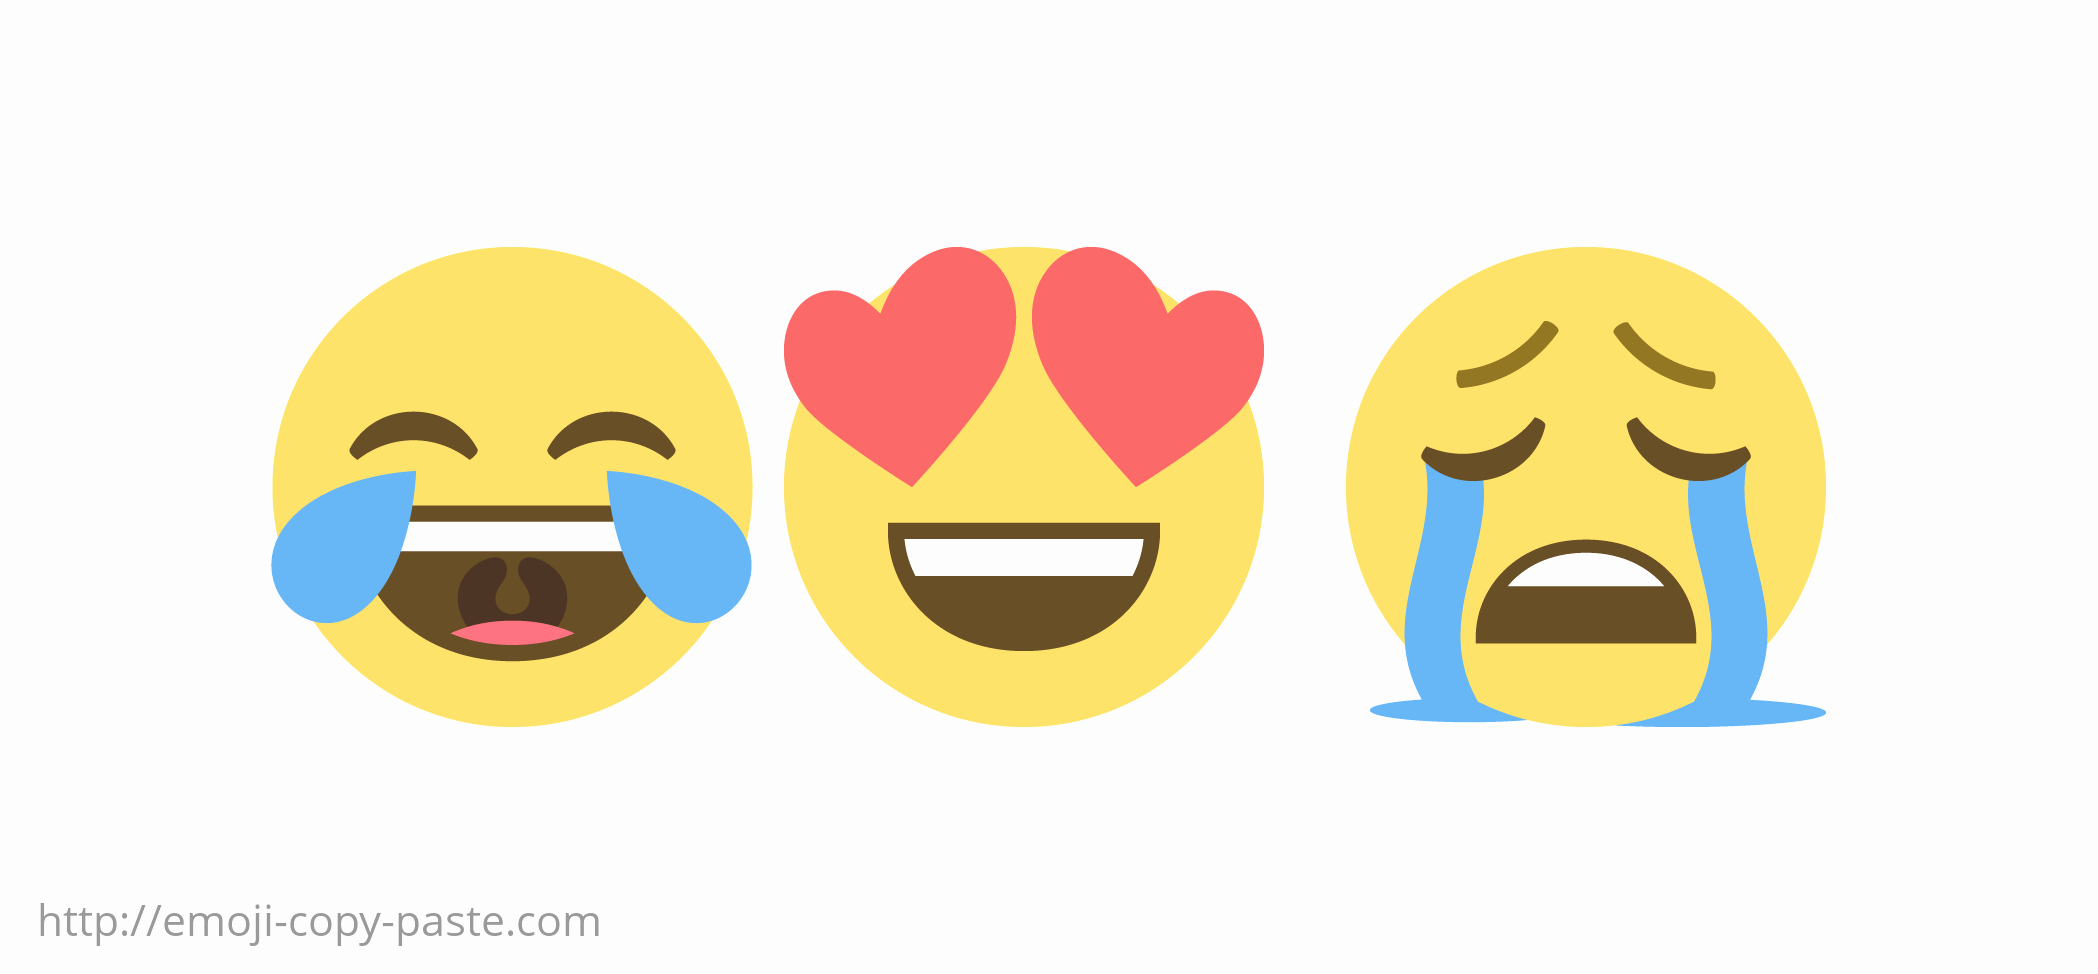 Emoji Pictures Copy and Paste Elegant Copy Paste top Faces Emojis